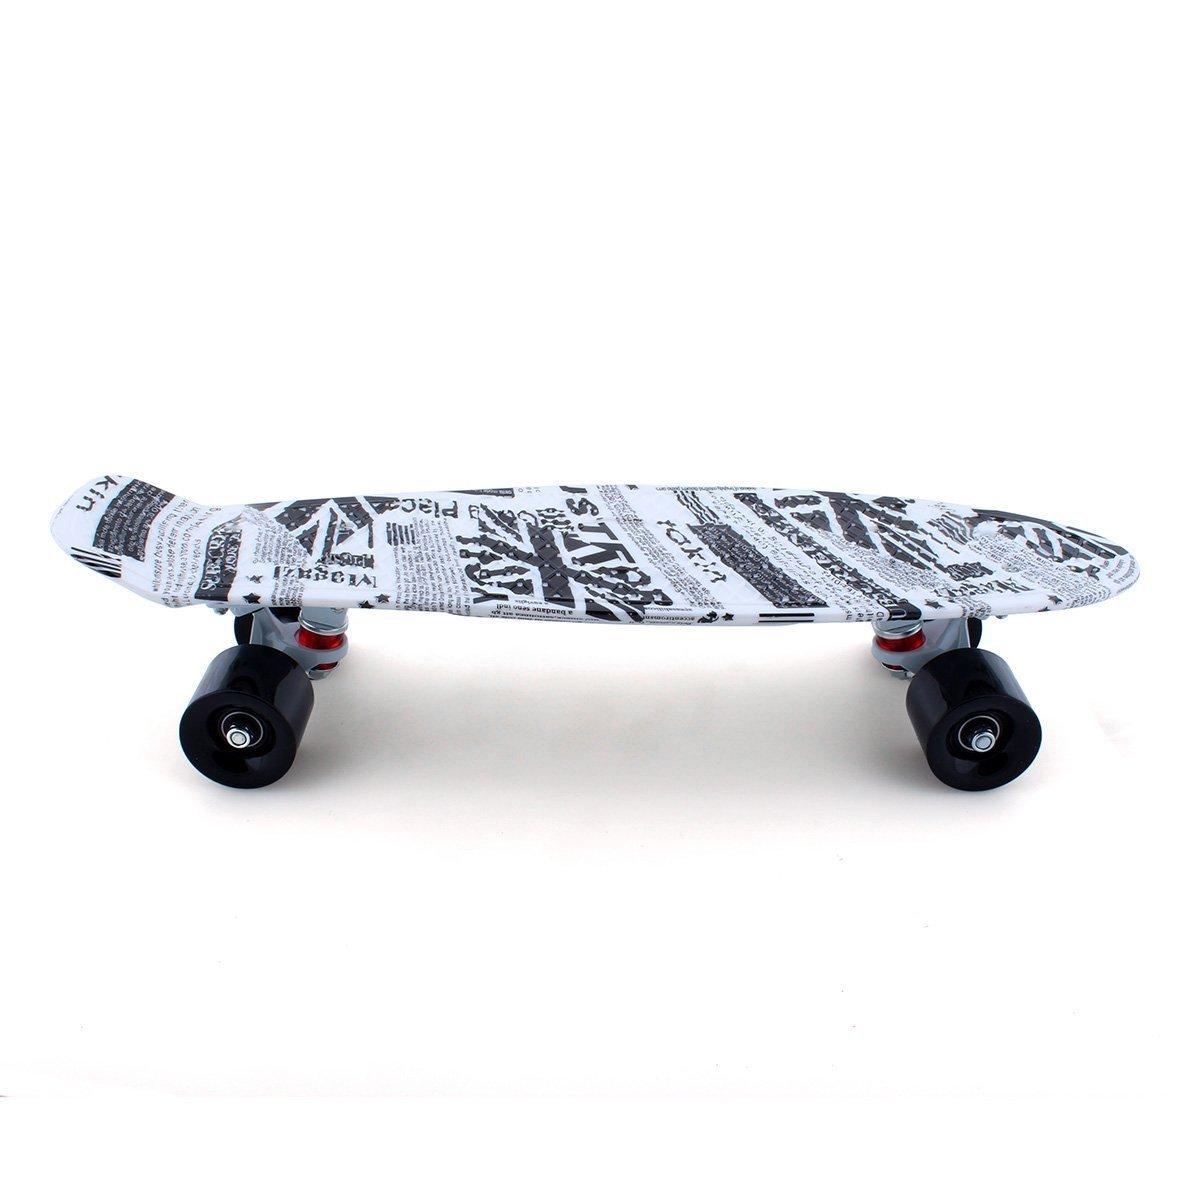 "Skateboards skateboards for kids Mini Board Complete 22"" Retro Skateboards New For Penny Style Plastic skateboards skateboards for boys/girls New Spaper"